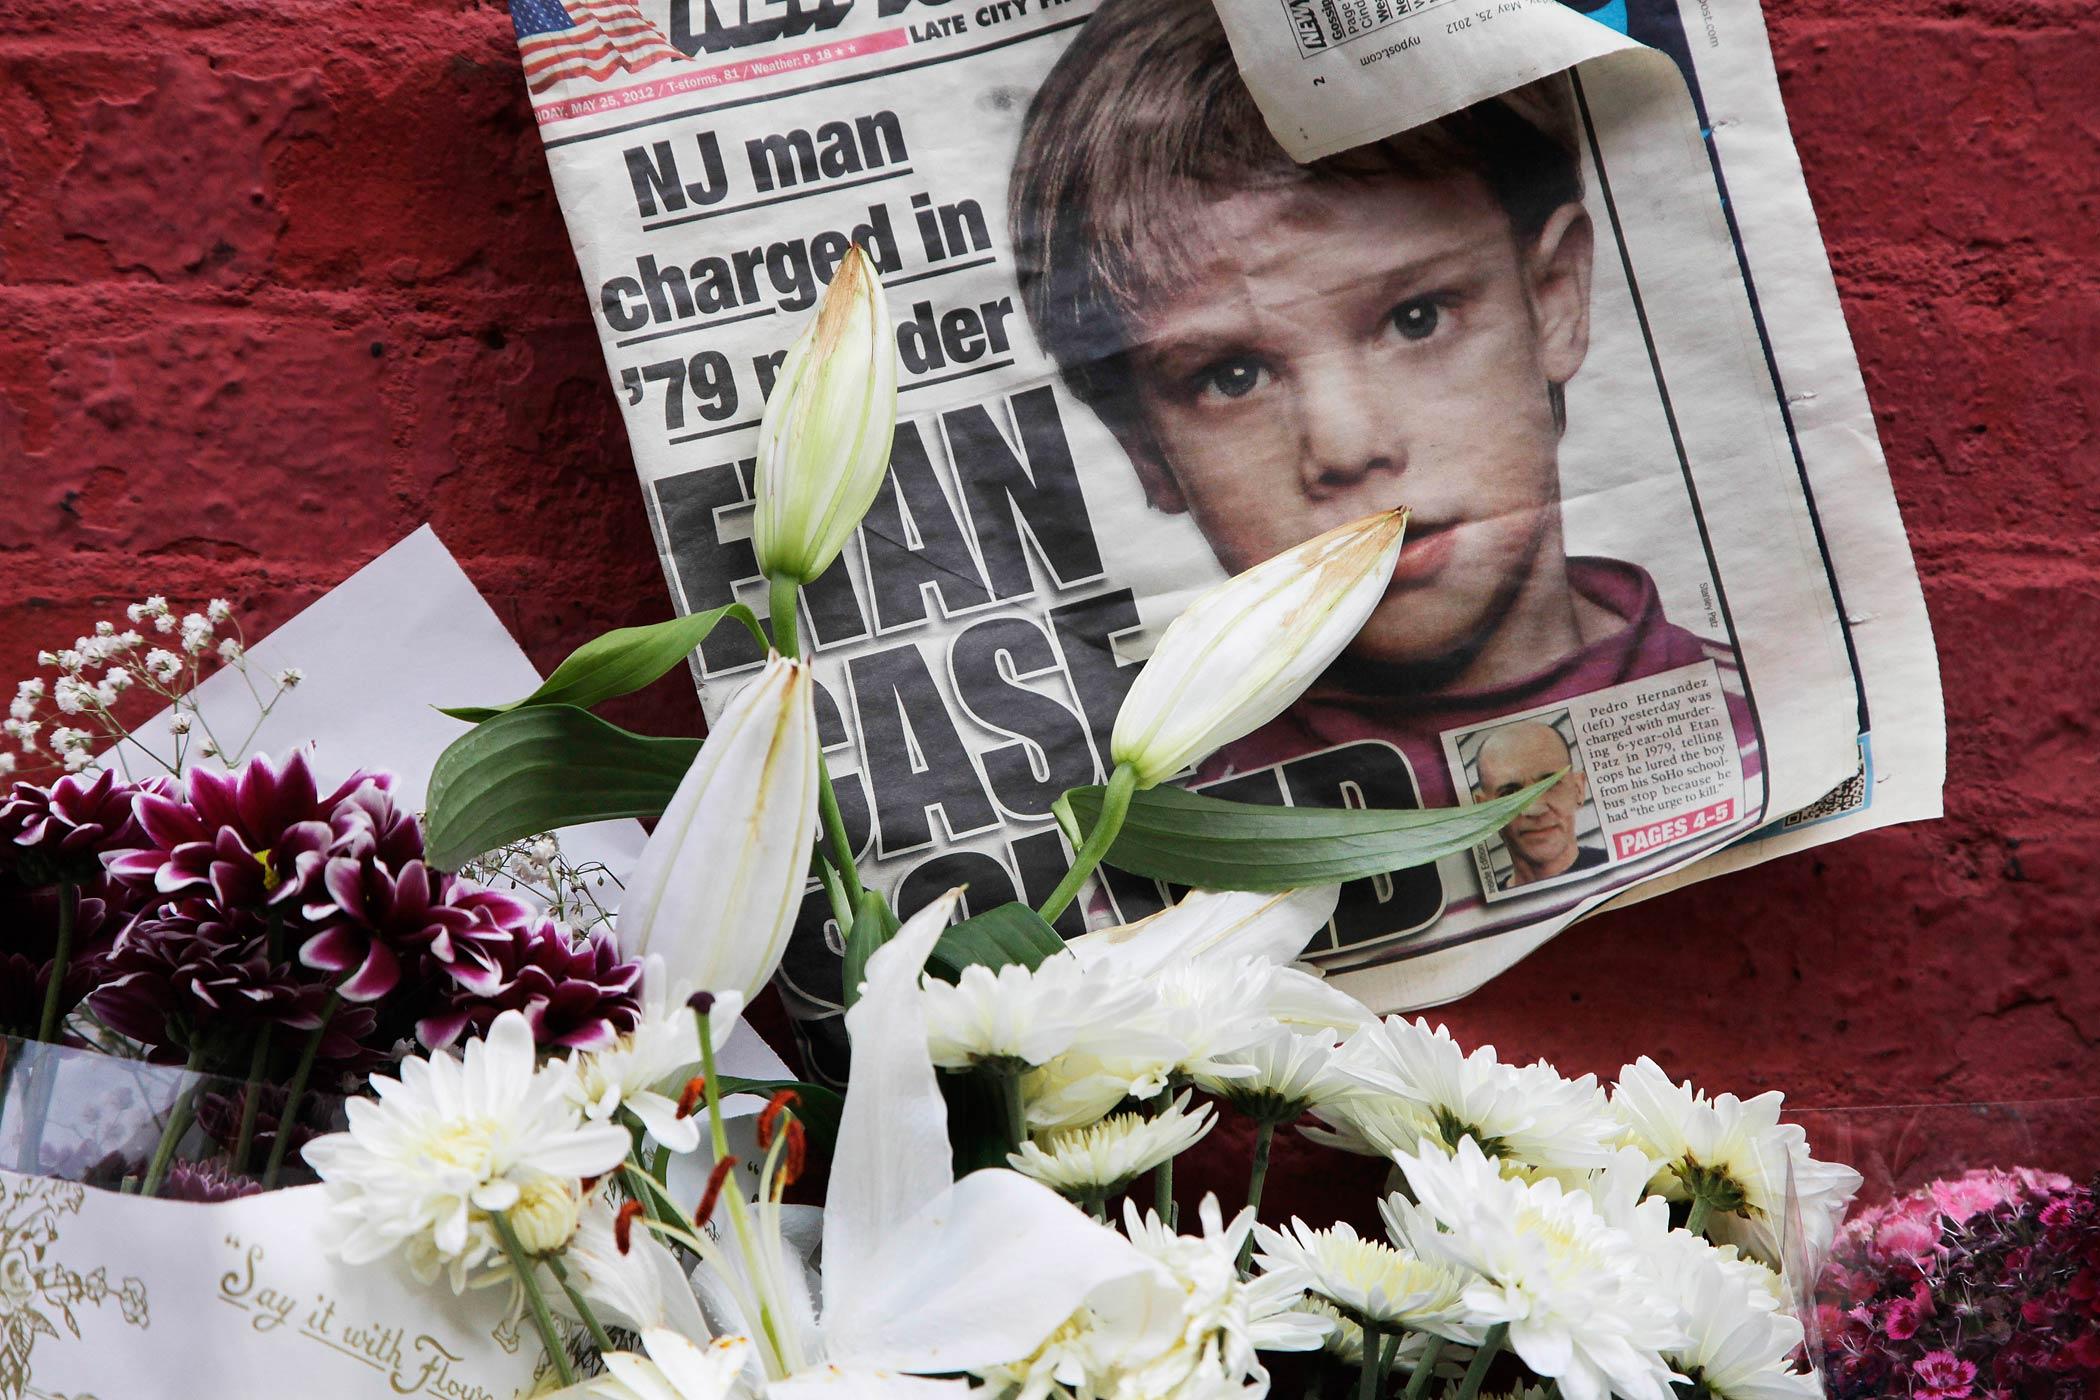 A memorial for Etan Patz is seen in the SoHo neighborhood of New York on May 28, 2012.